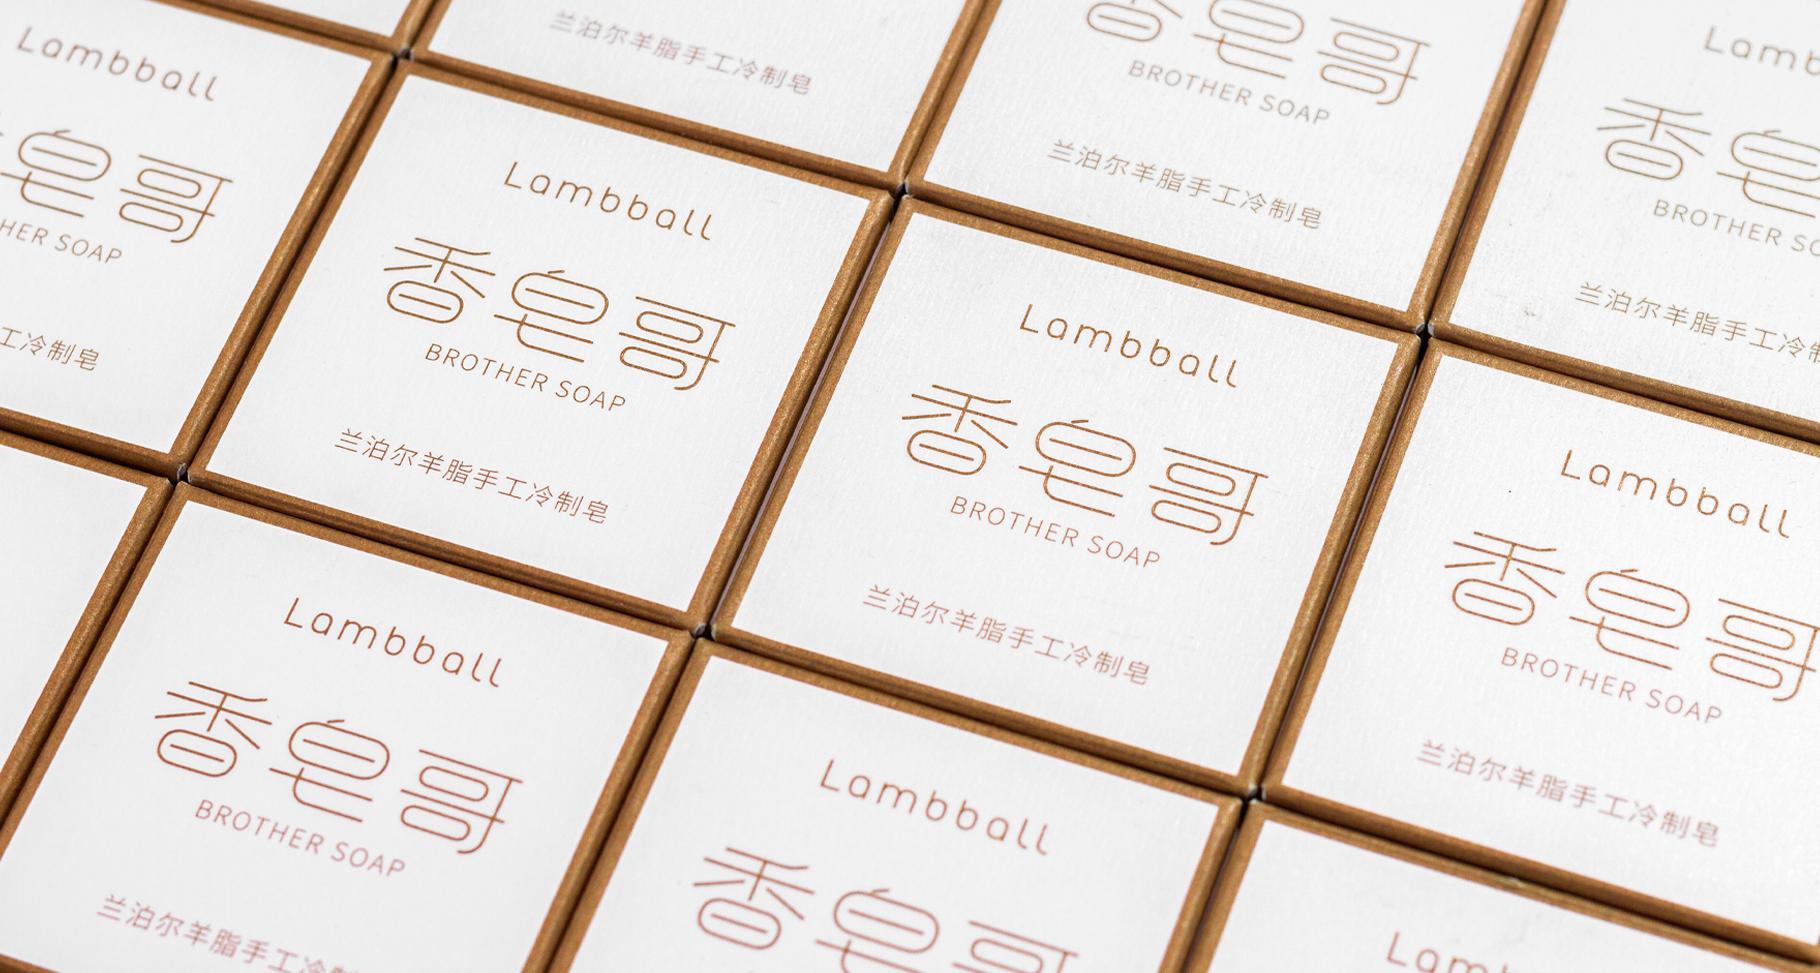 lambball品牌系列产品包装设计 第5张